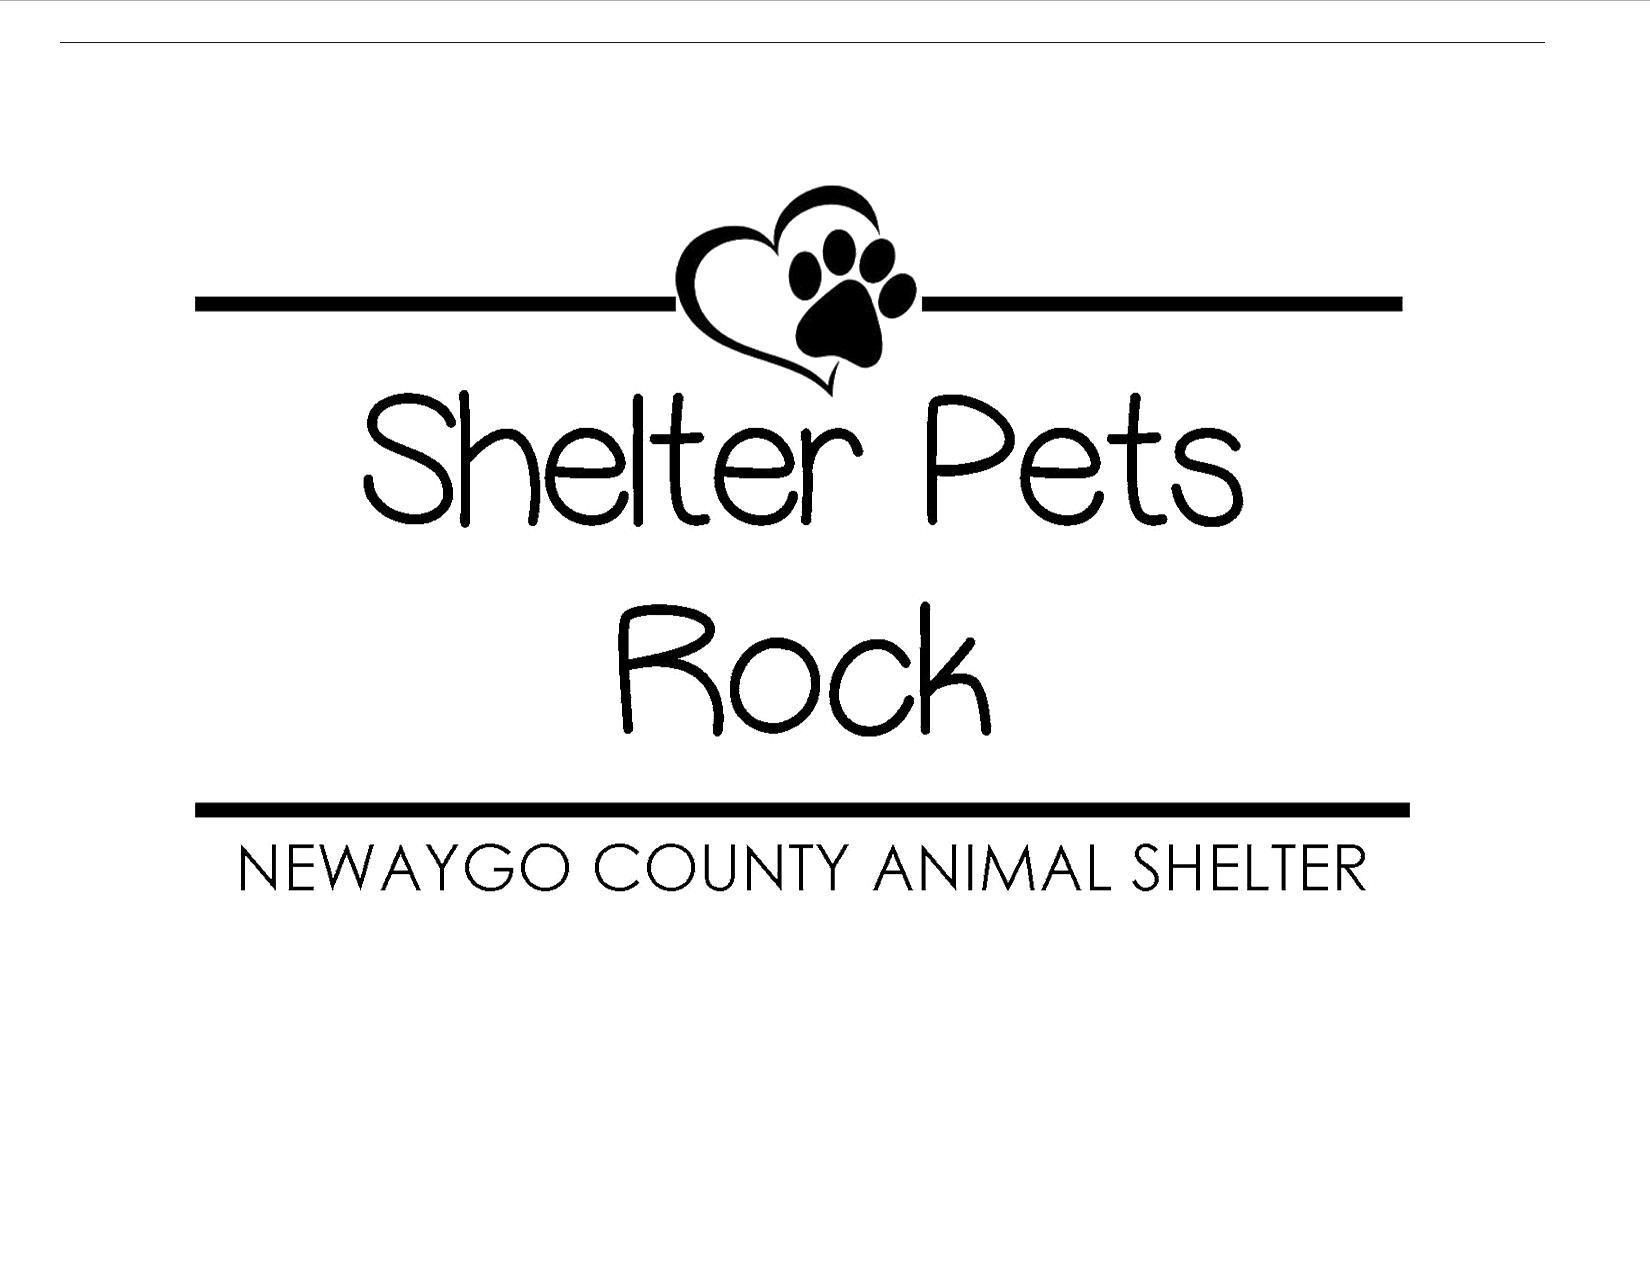 Newaygo County Animal Shelter